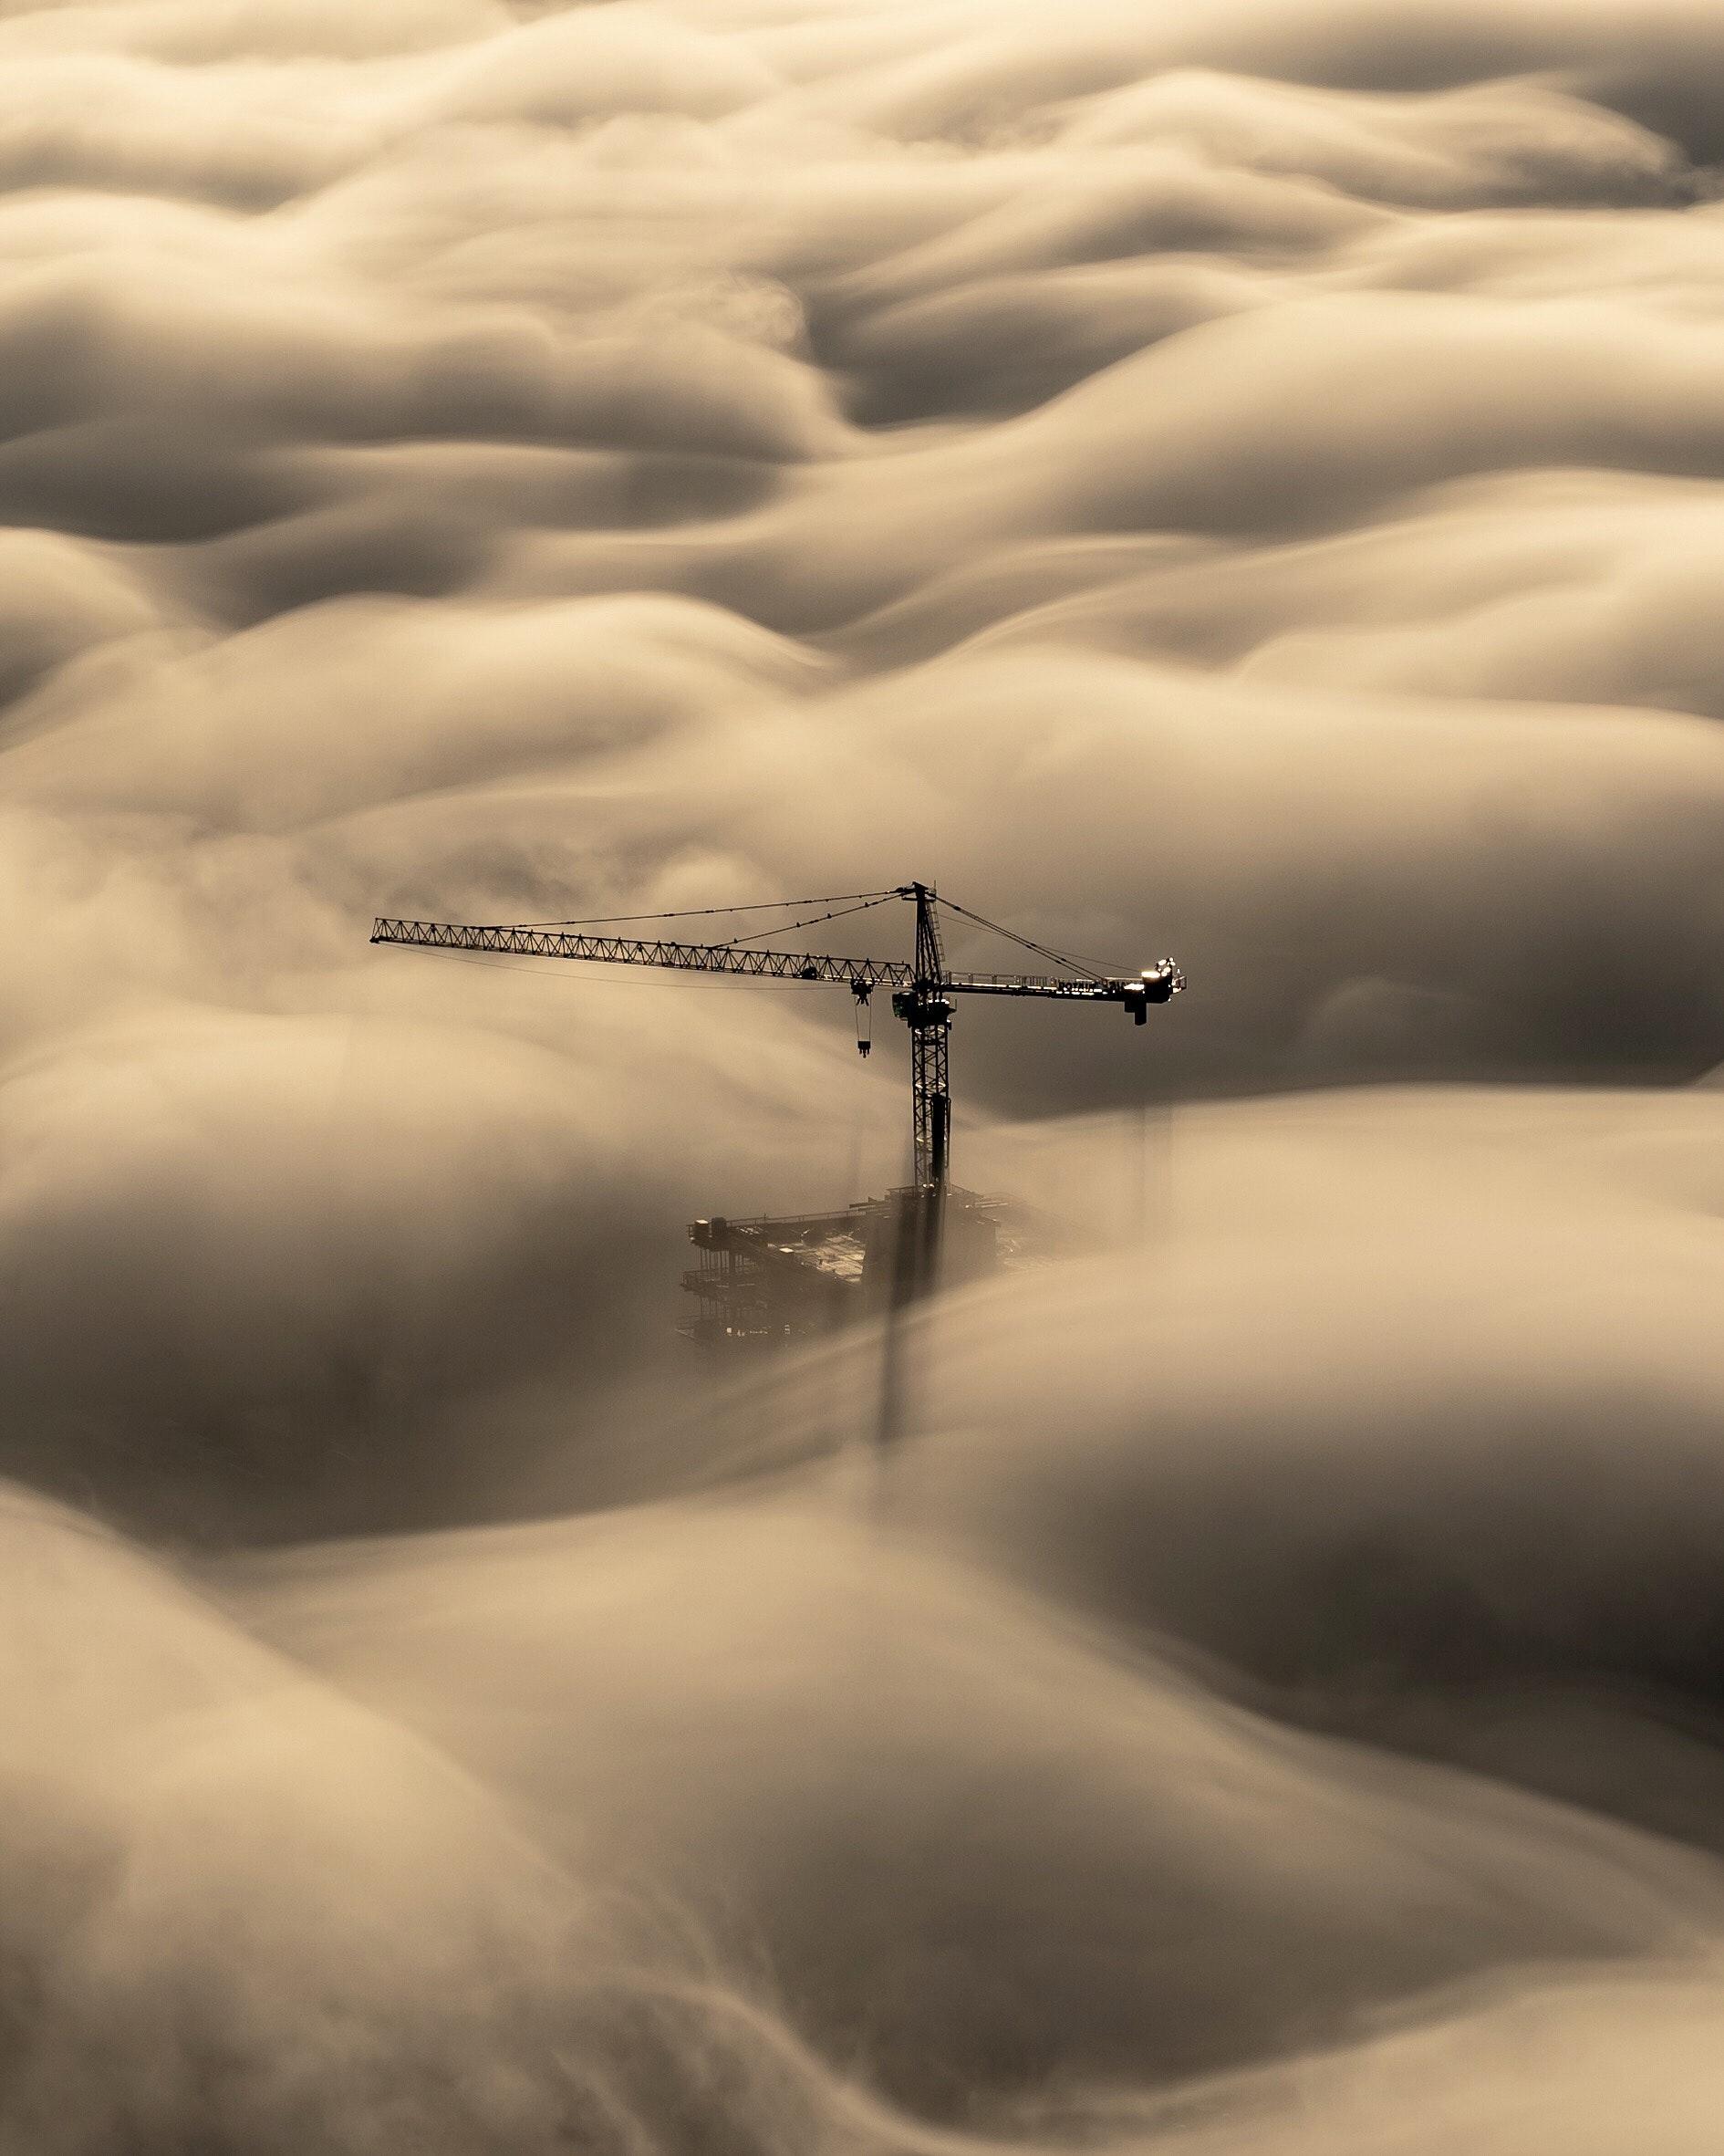 Photo  by  Vishal Shah  from Pexels